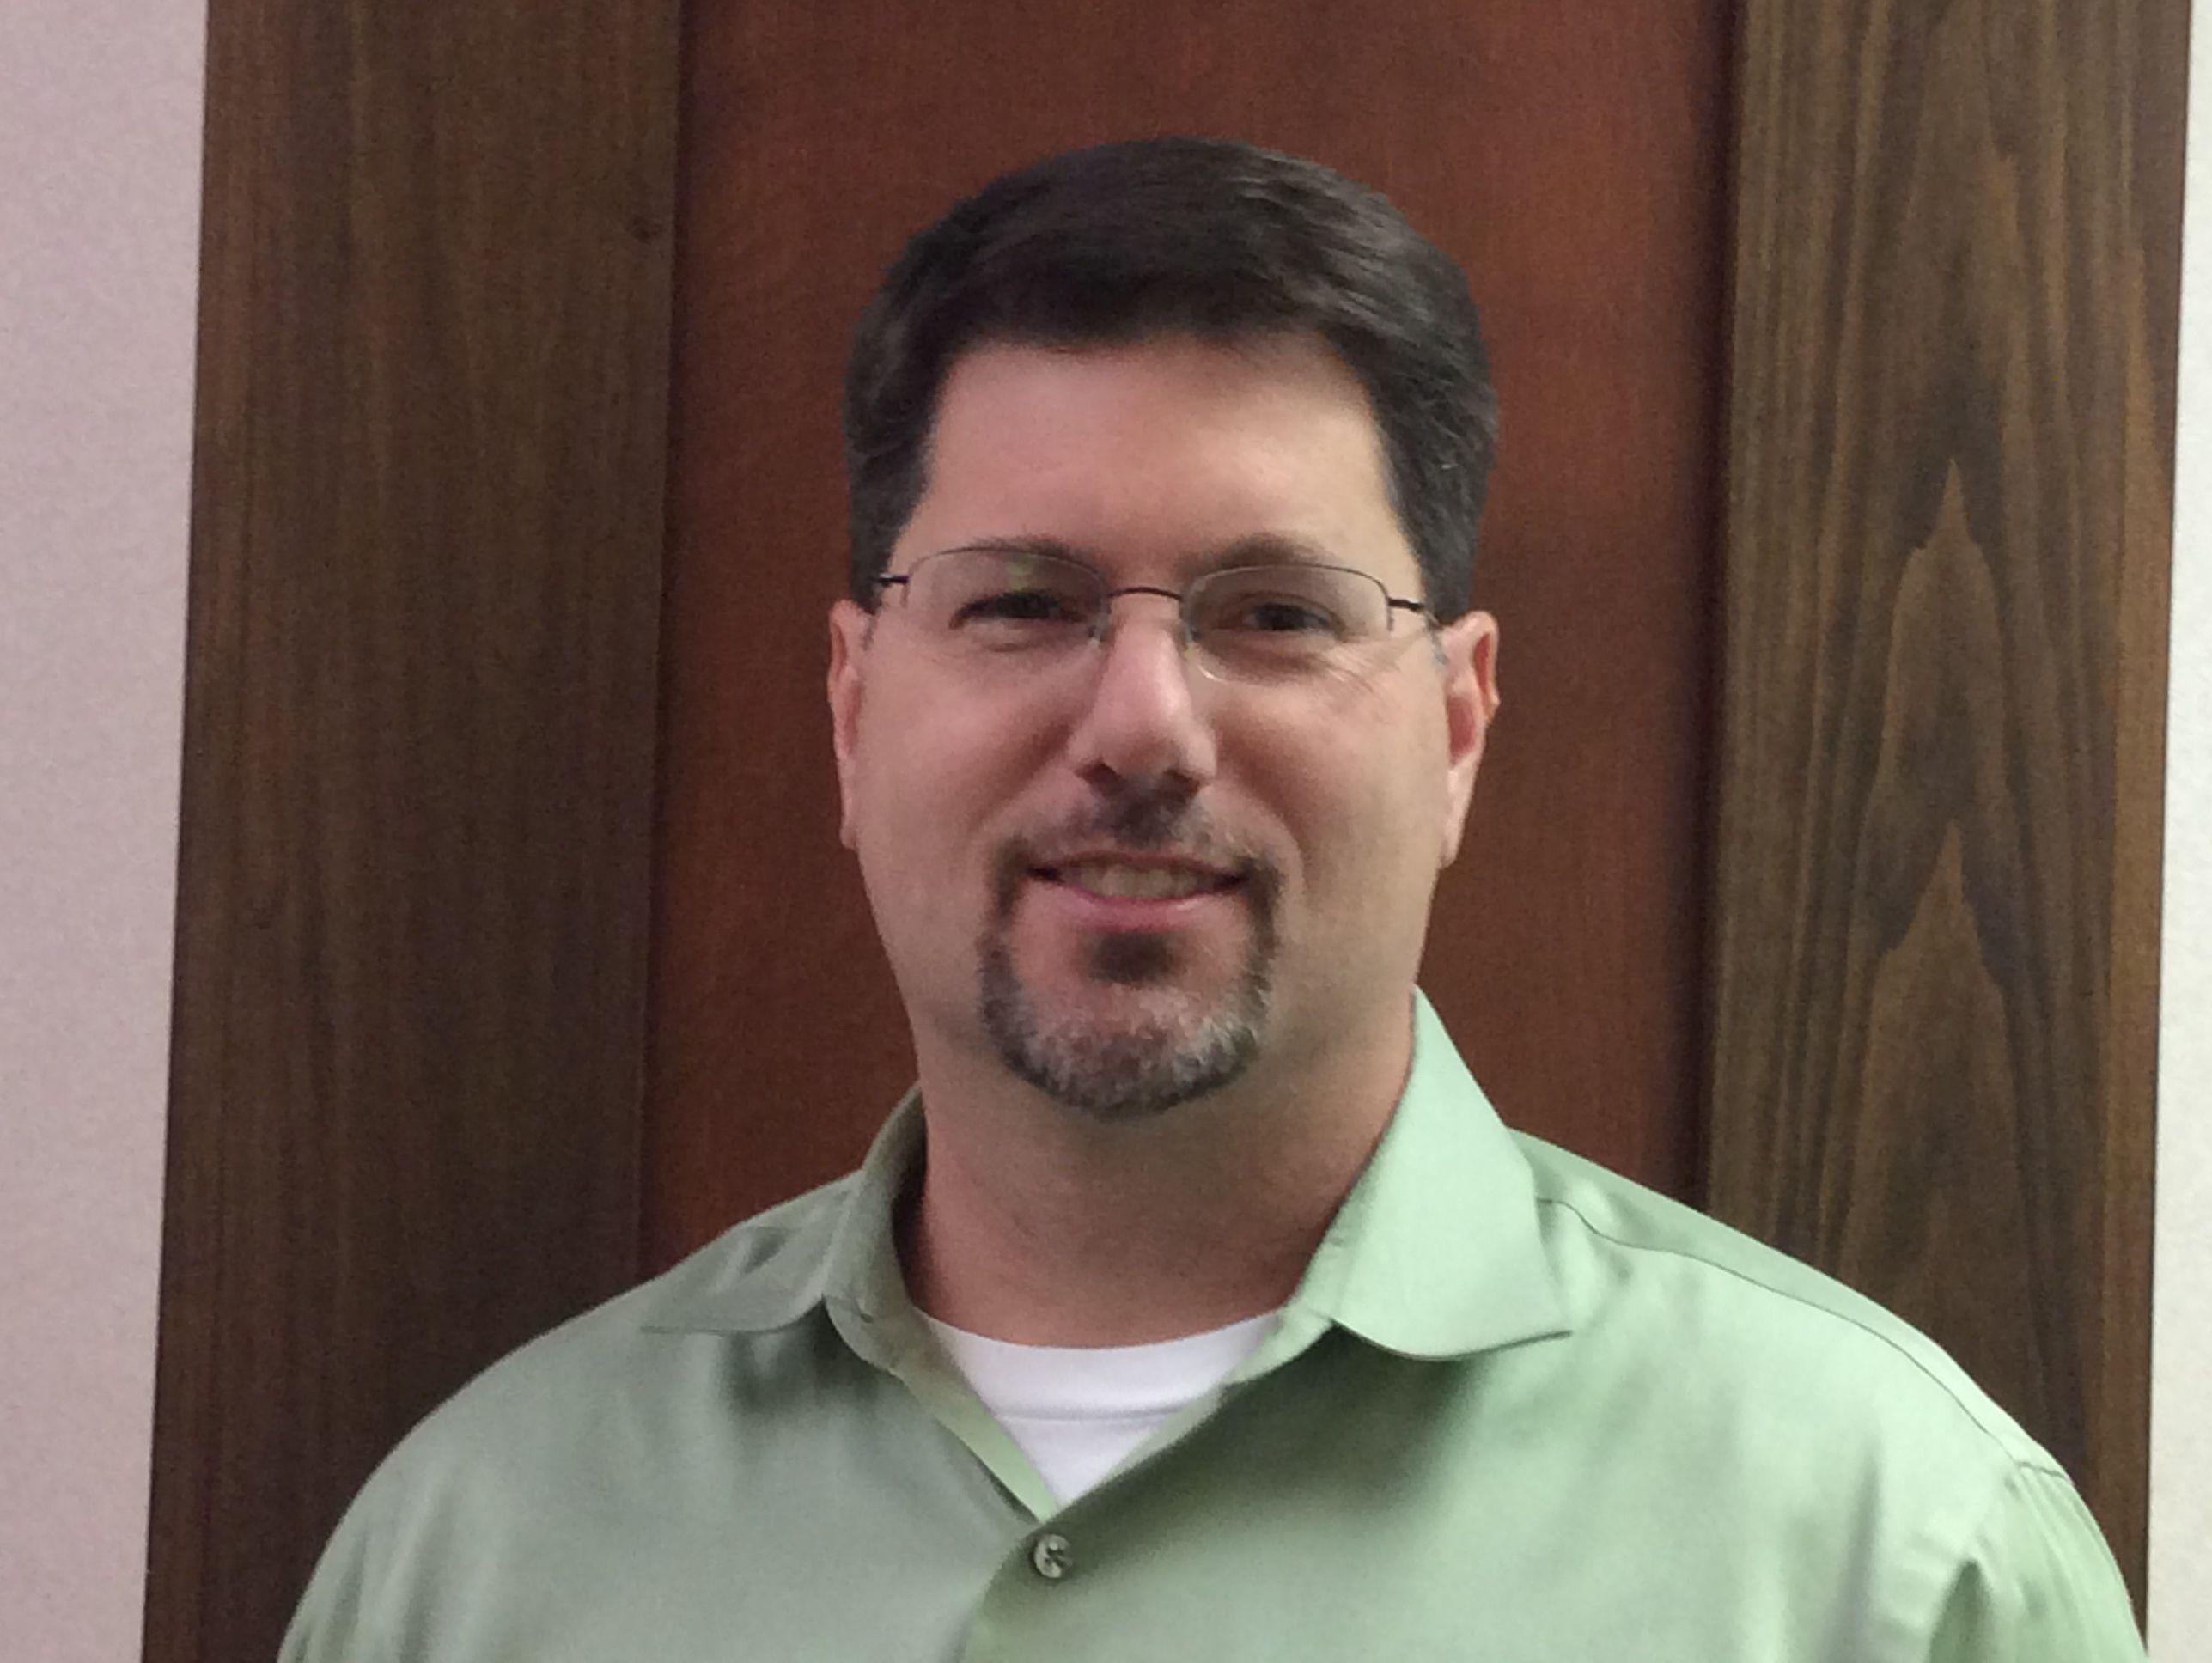 Bowling columnist Scott Badley